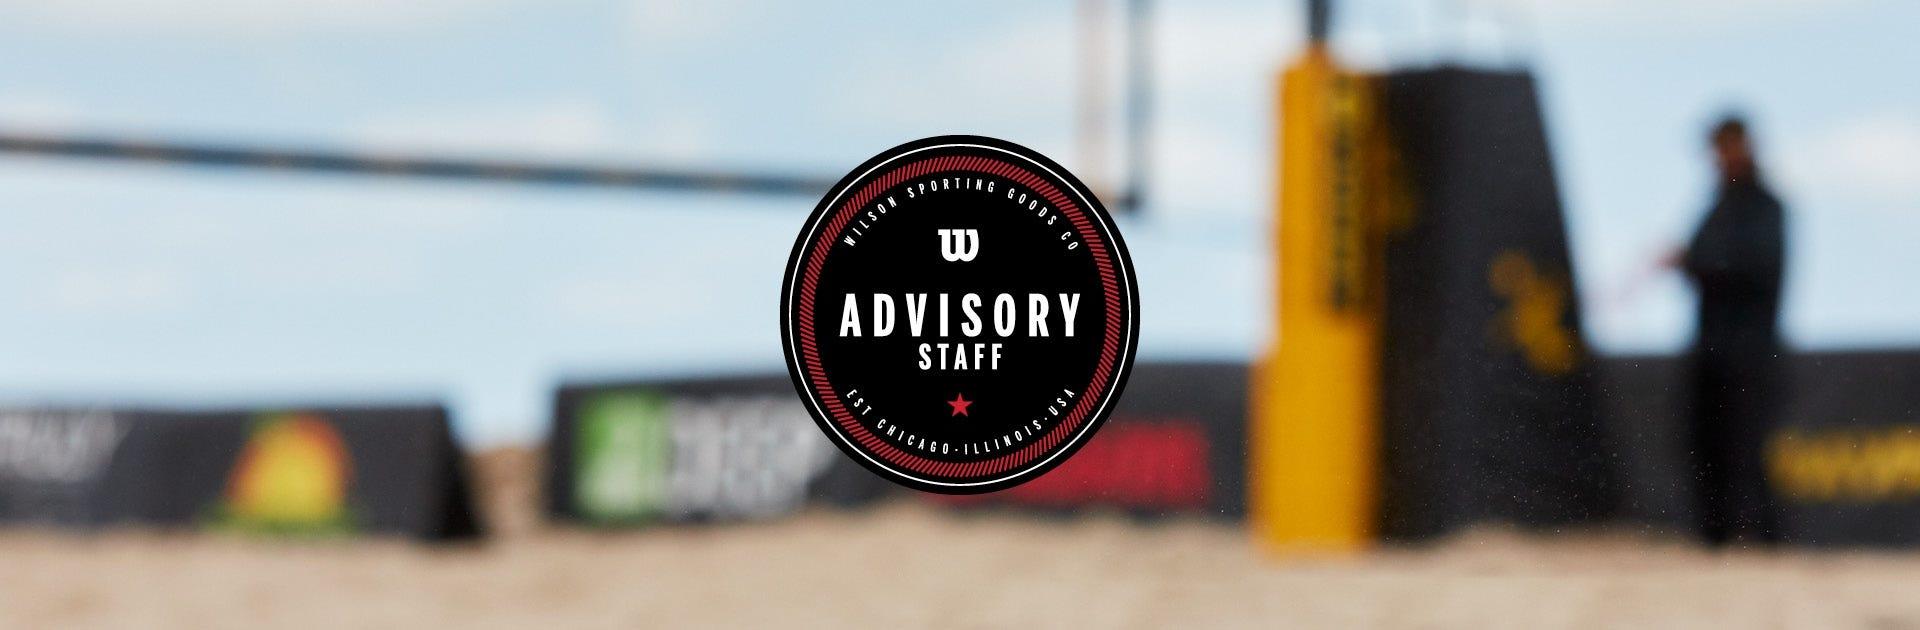 Wilson Beach Volleyball Advisory Staff